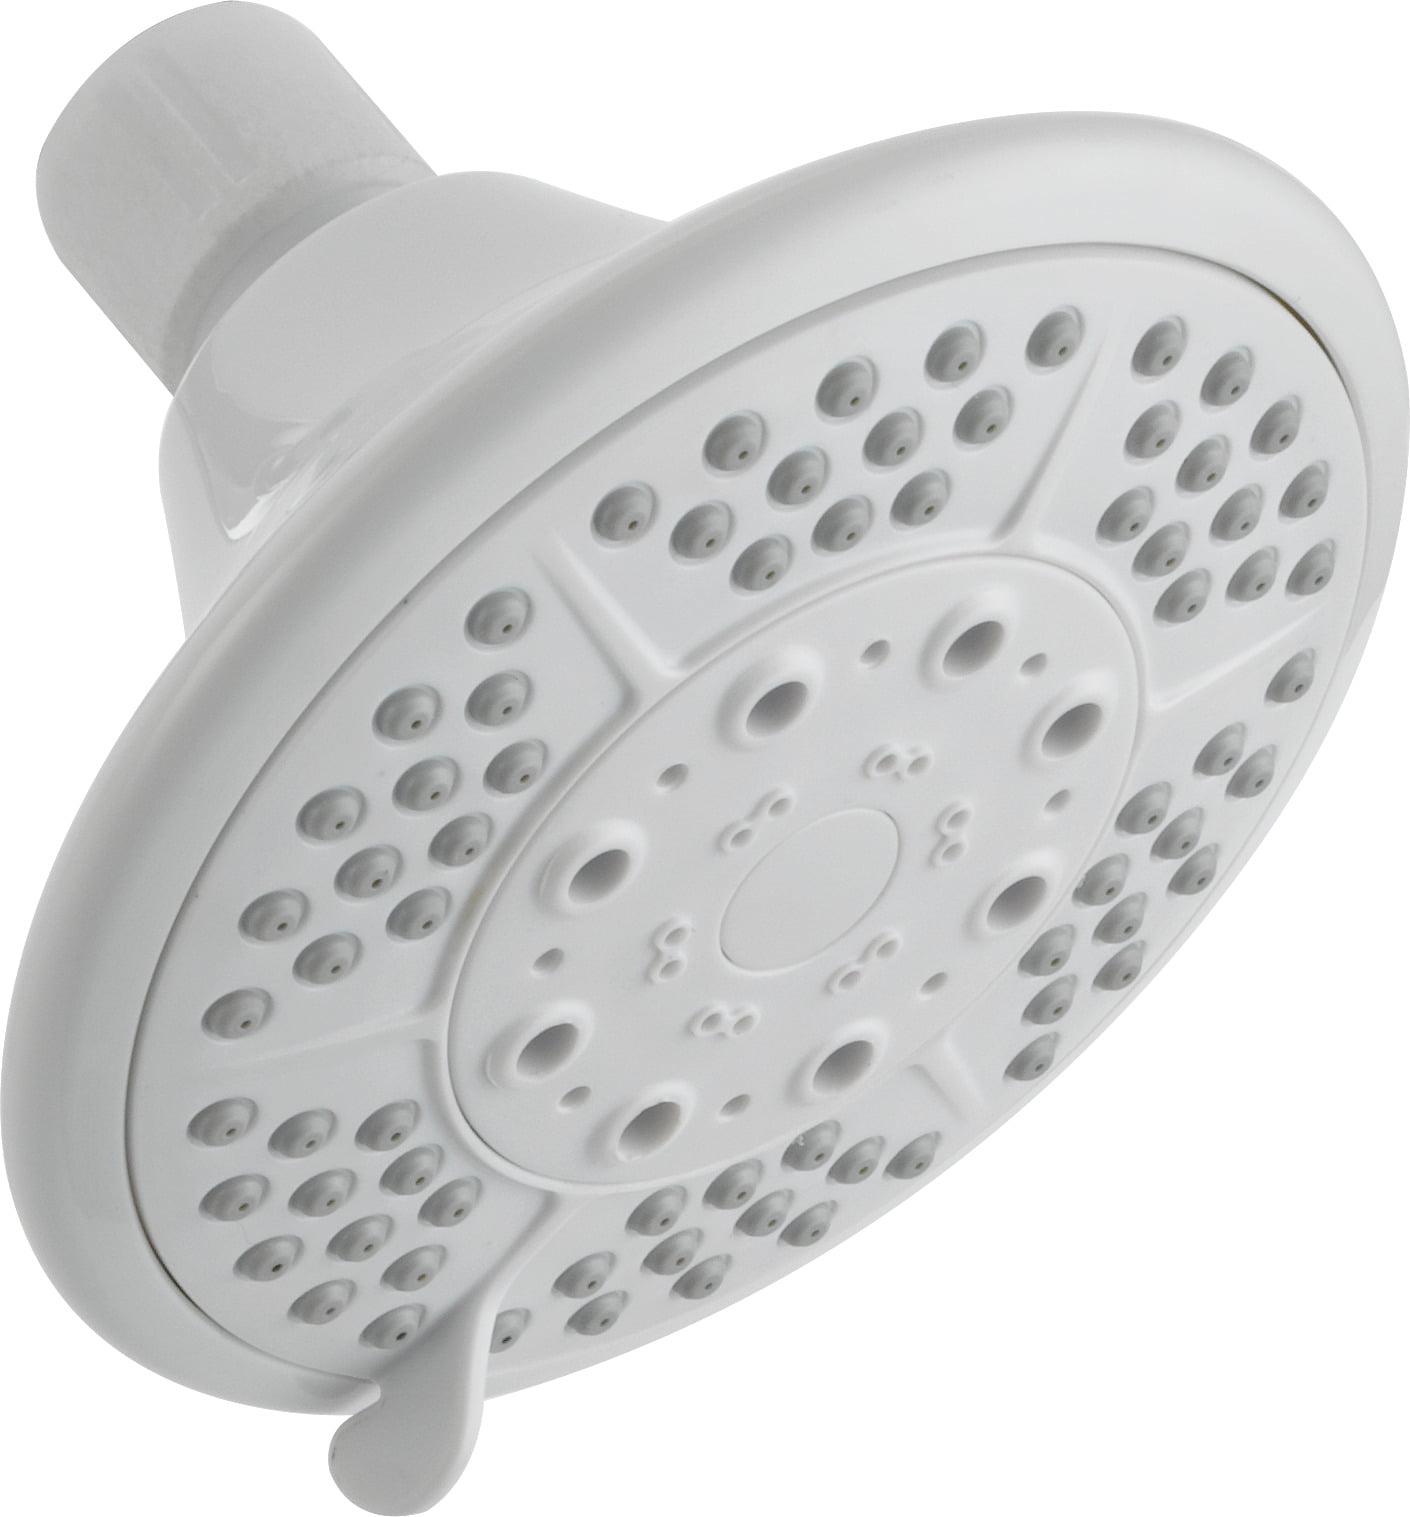 Peerless 5 Spray Fixed Head by Peerless Faucets